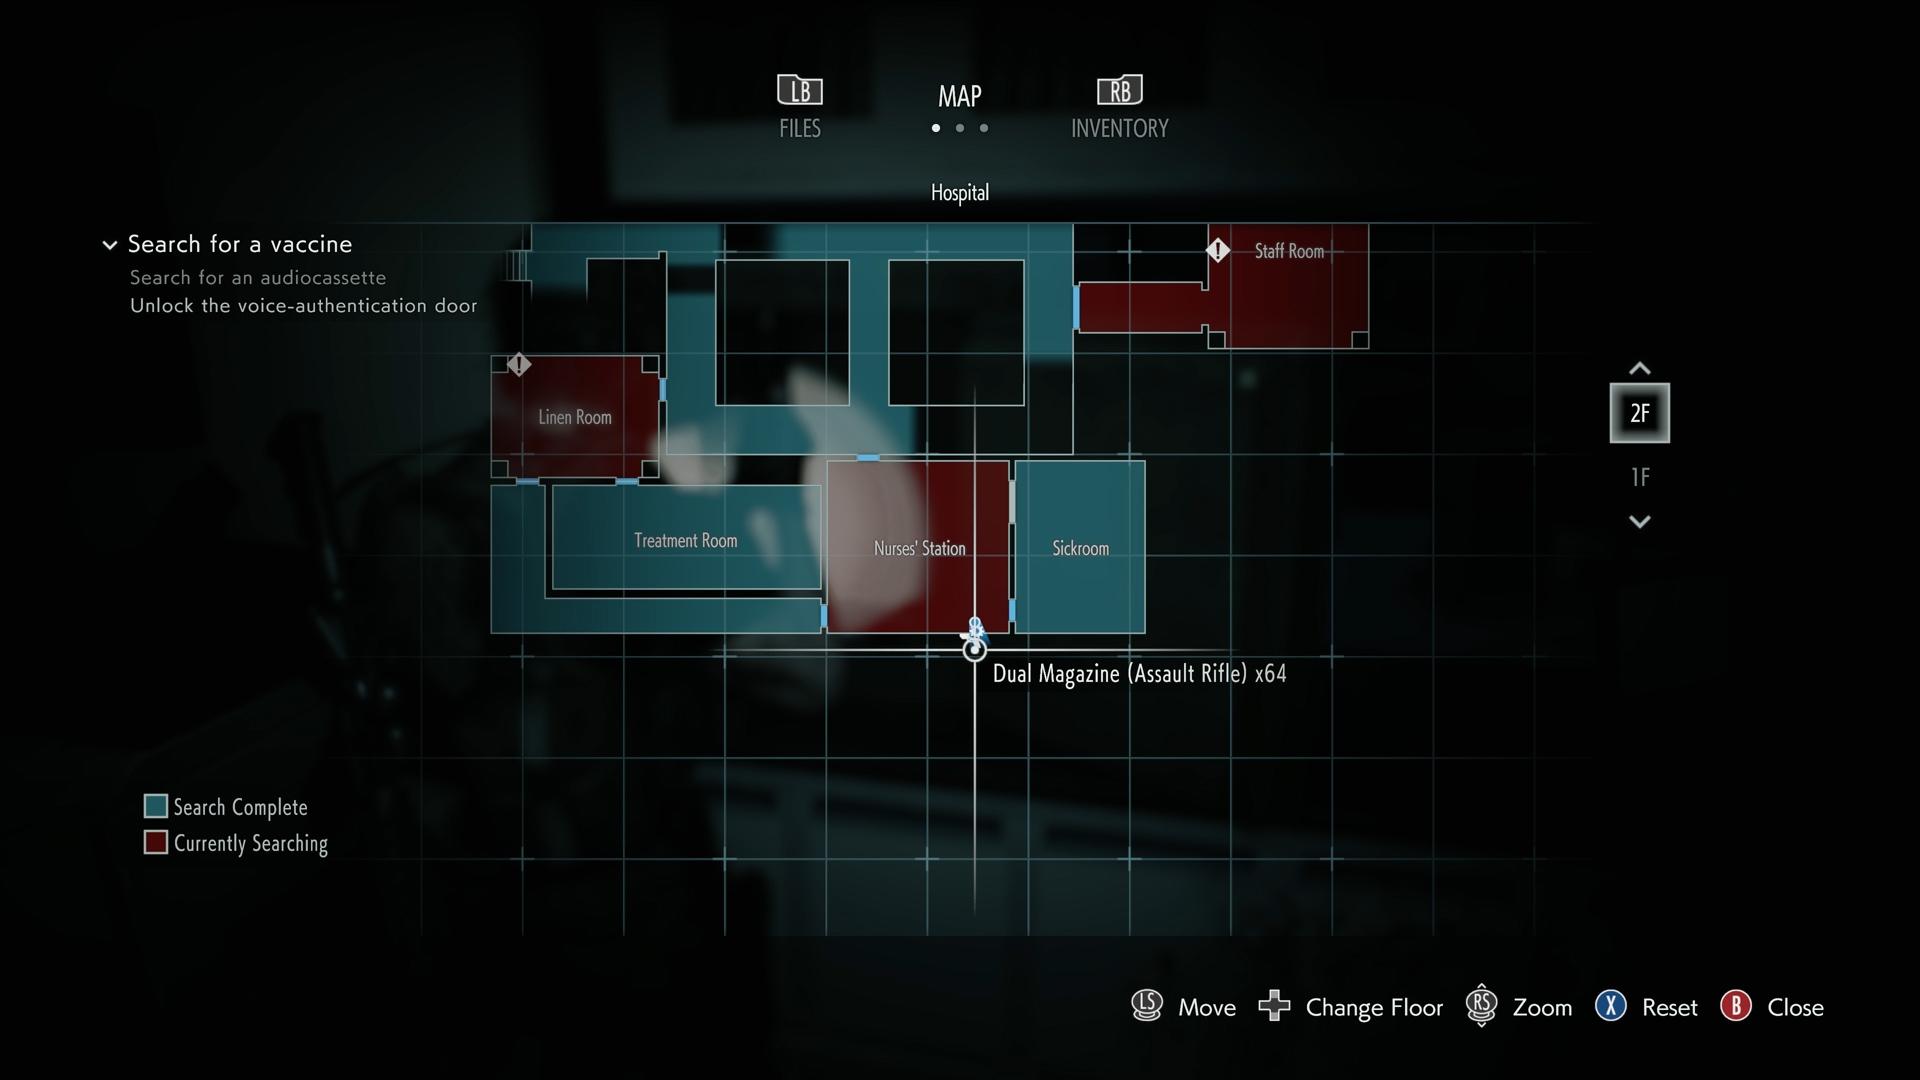 Resident Evil 3 Assault Rifle Dual Magazine location map